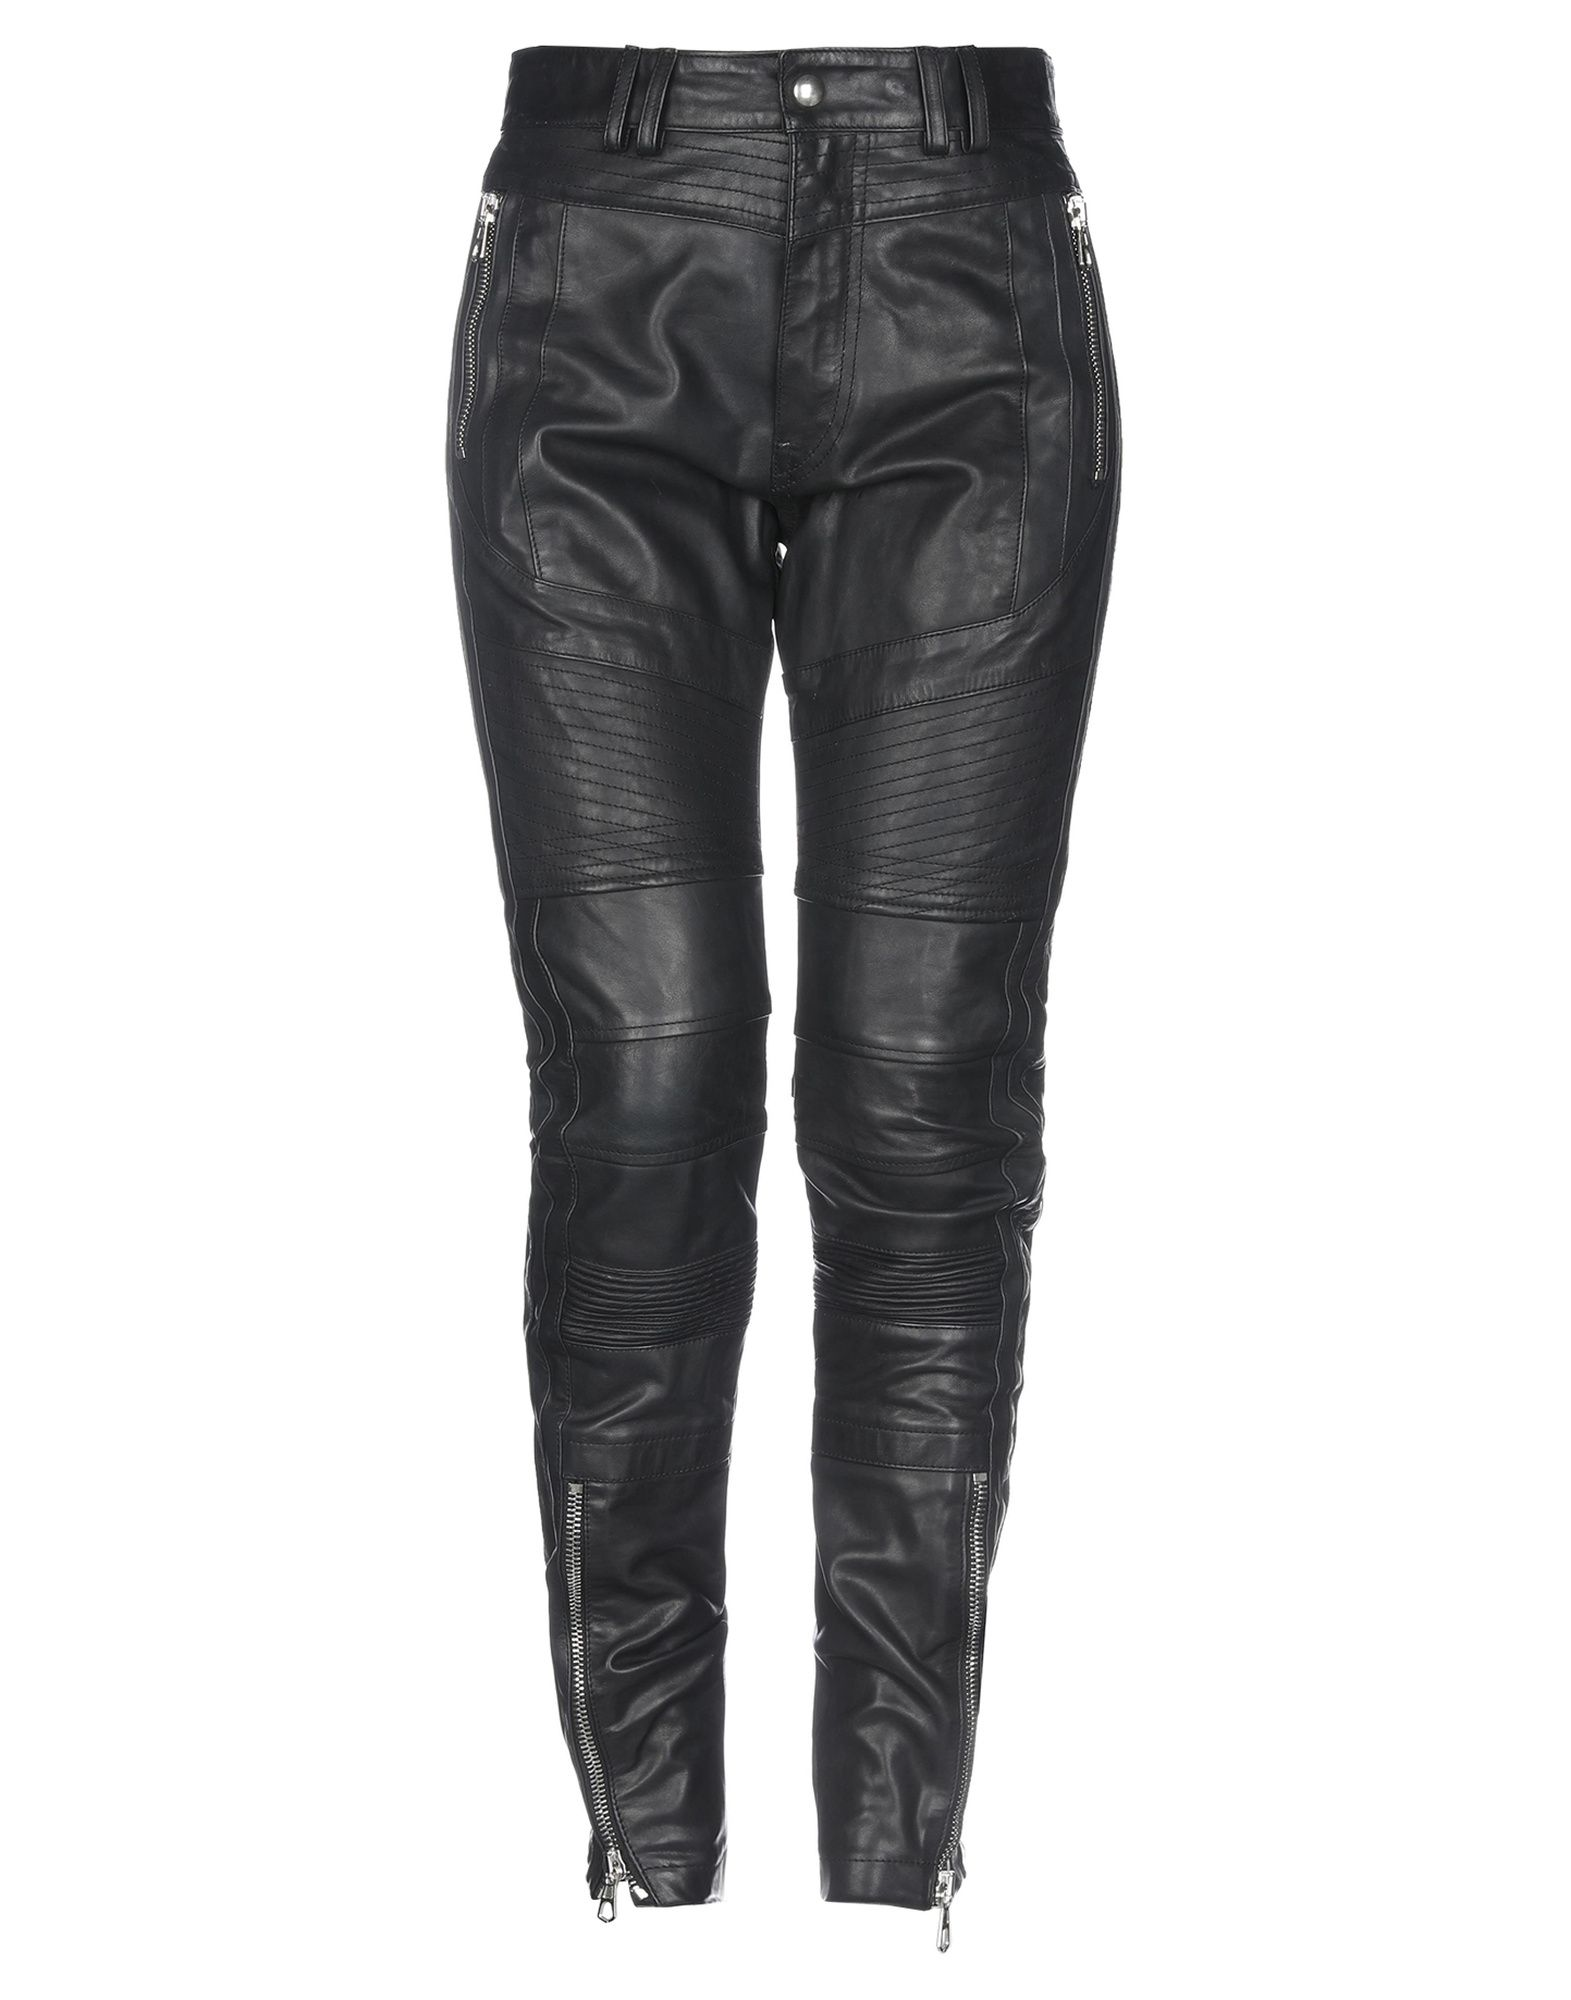 Pantalone Vintage De Luxe Luxe donna - 13333211JU  billiger Verkauf